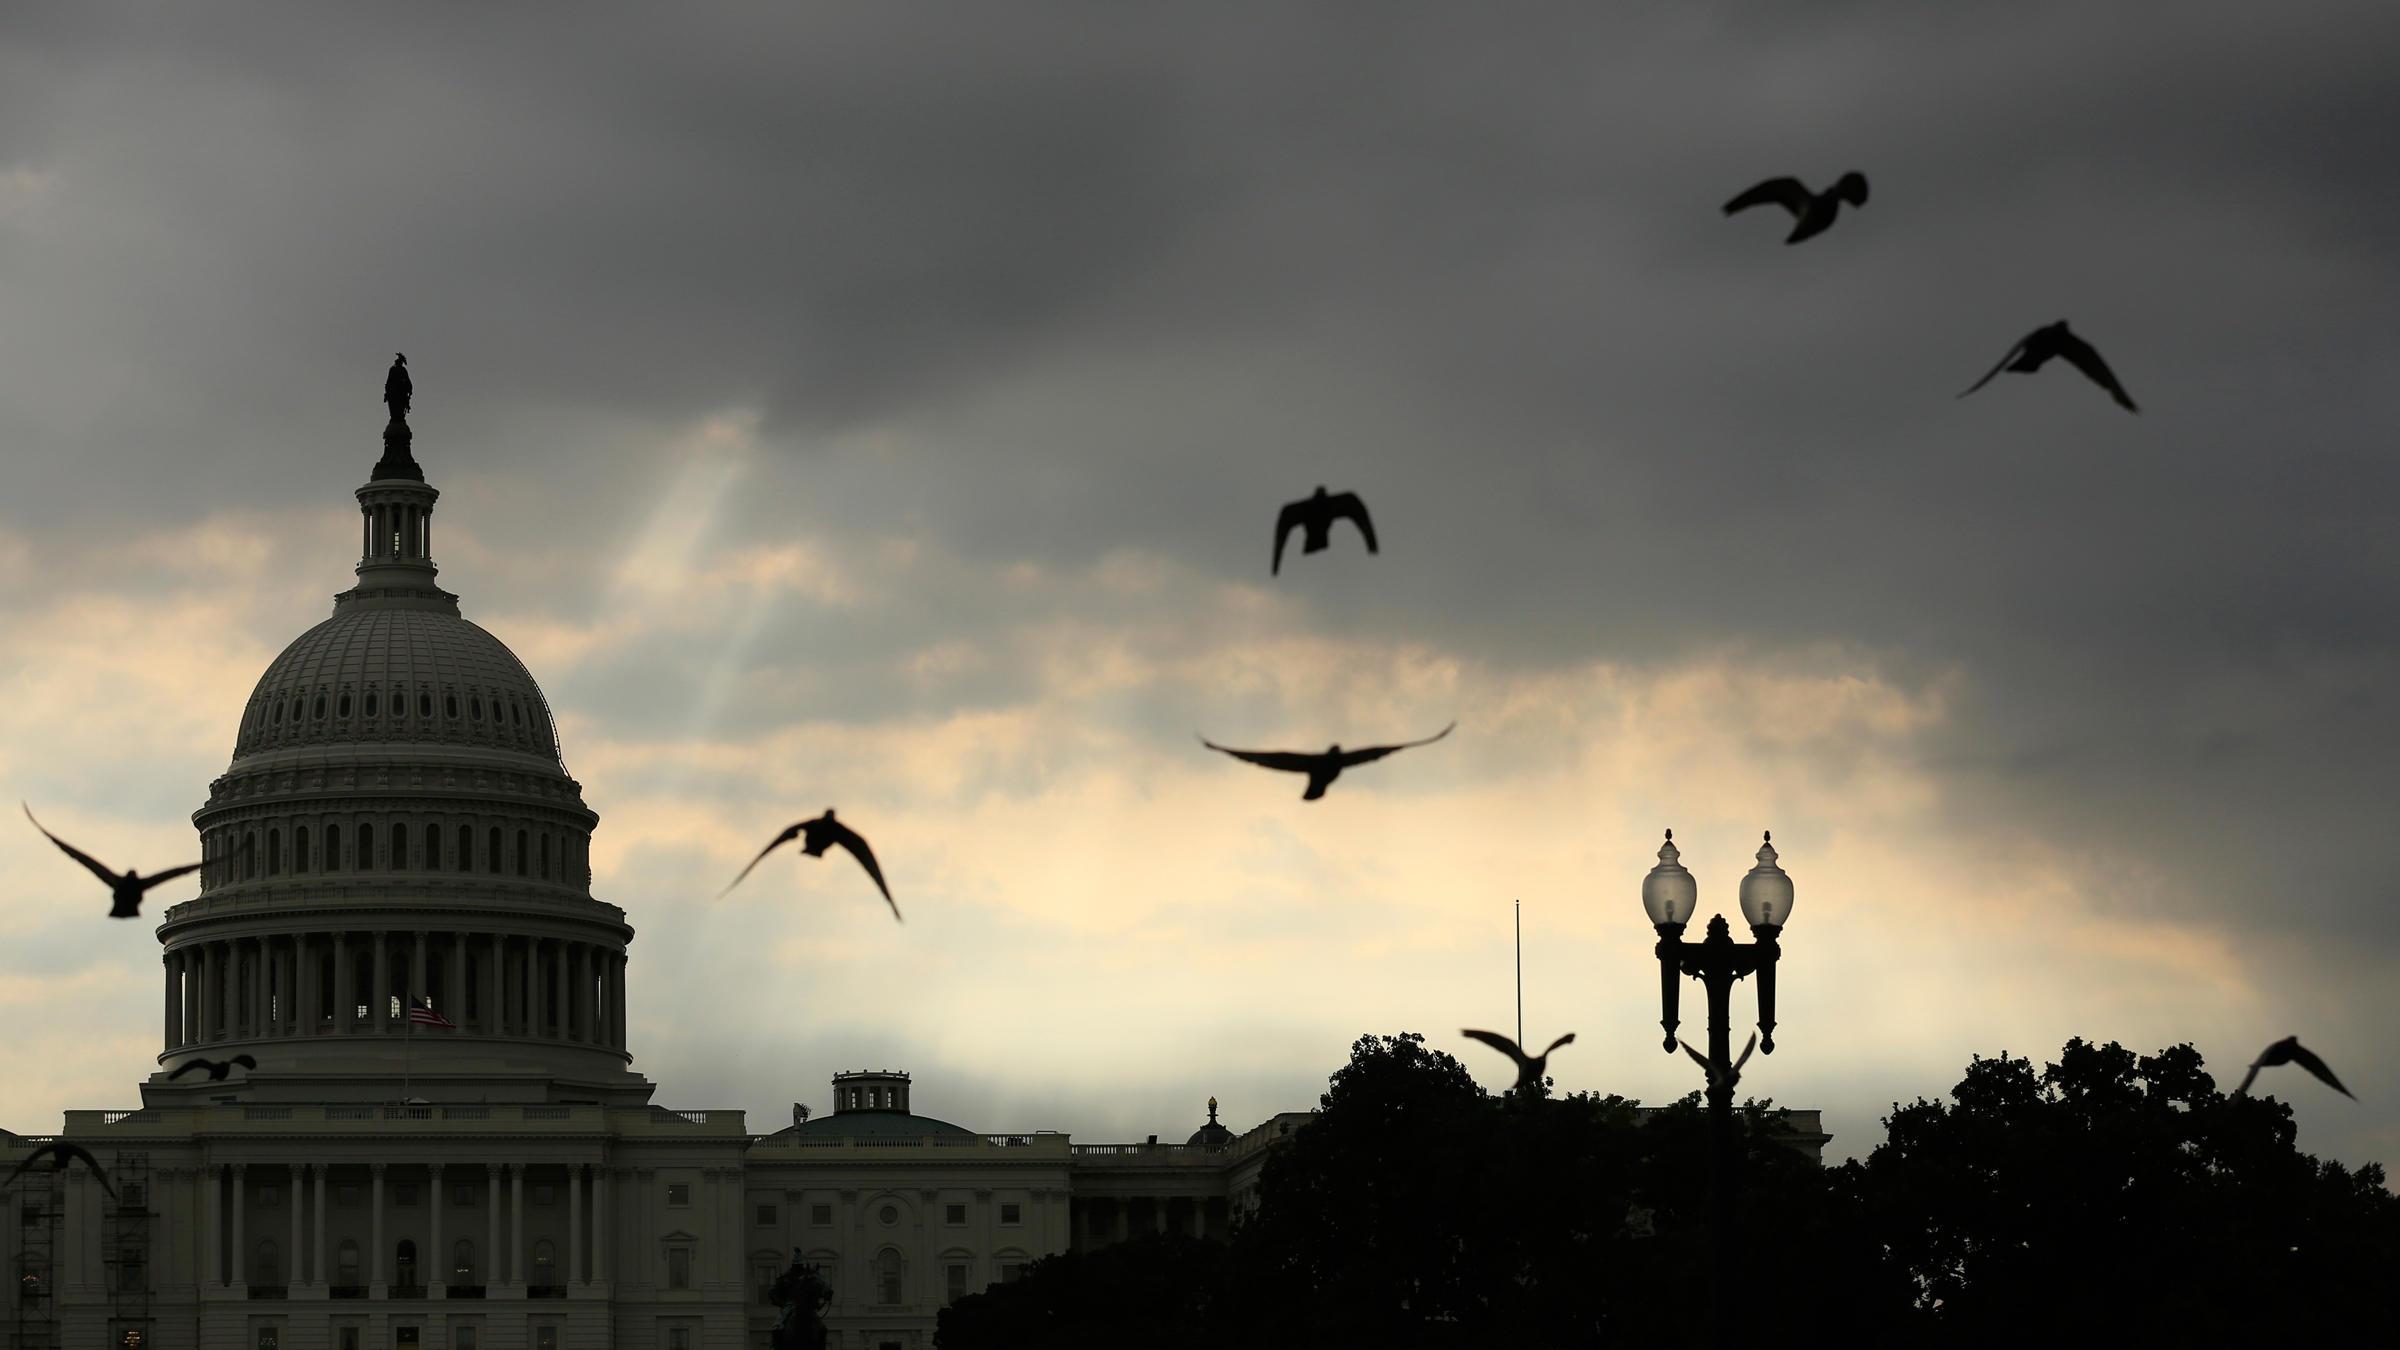 Rock Pigeons fly past the U.S. Capitol building in Washington, D.C. Kevin Lamarque/Reuters/Corbis